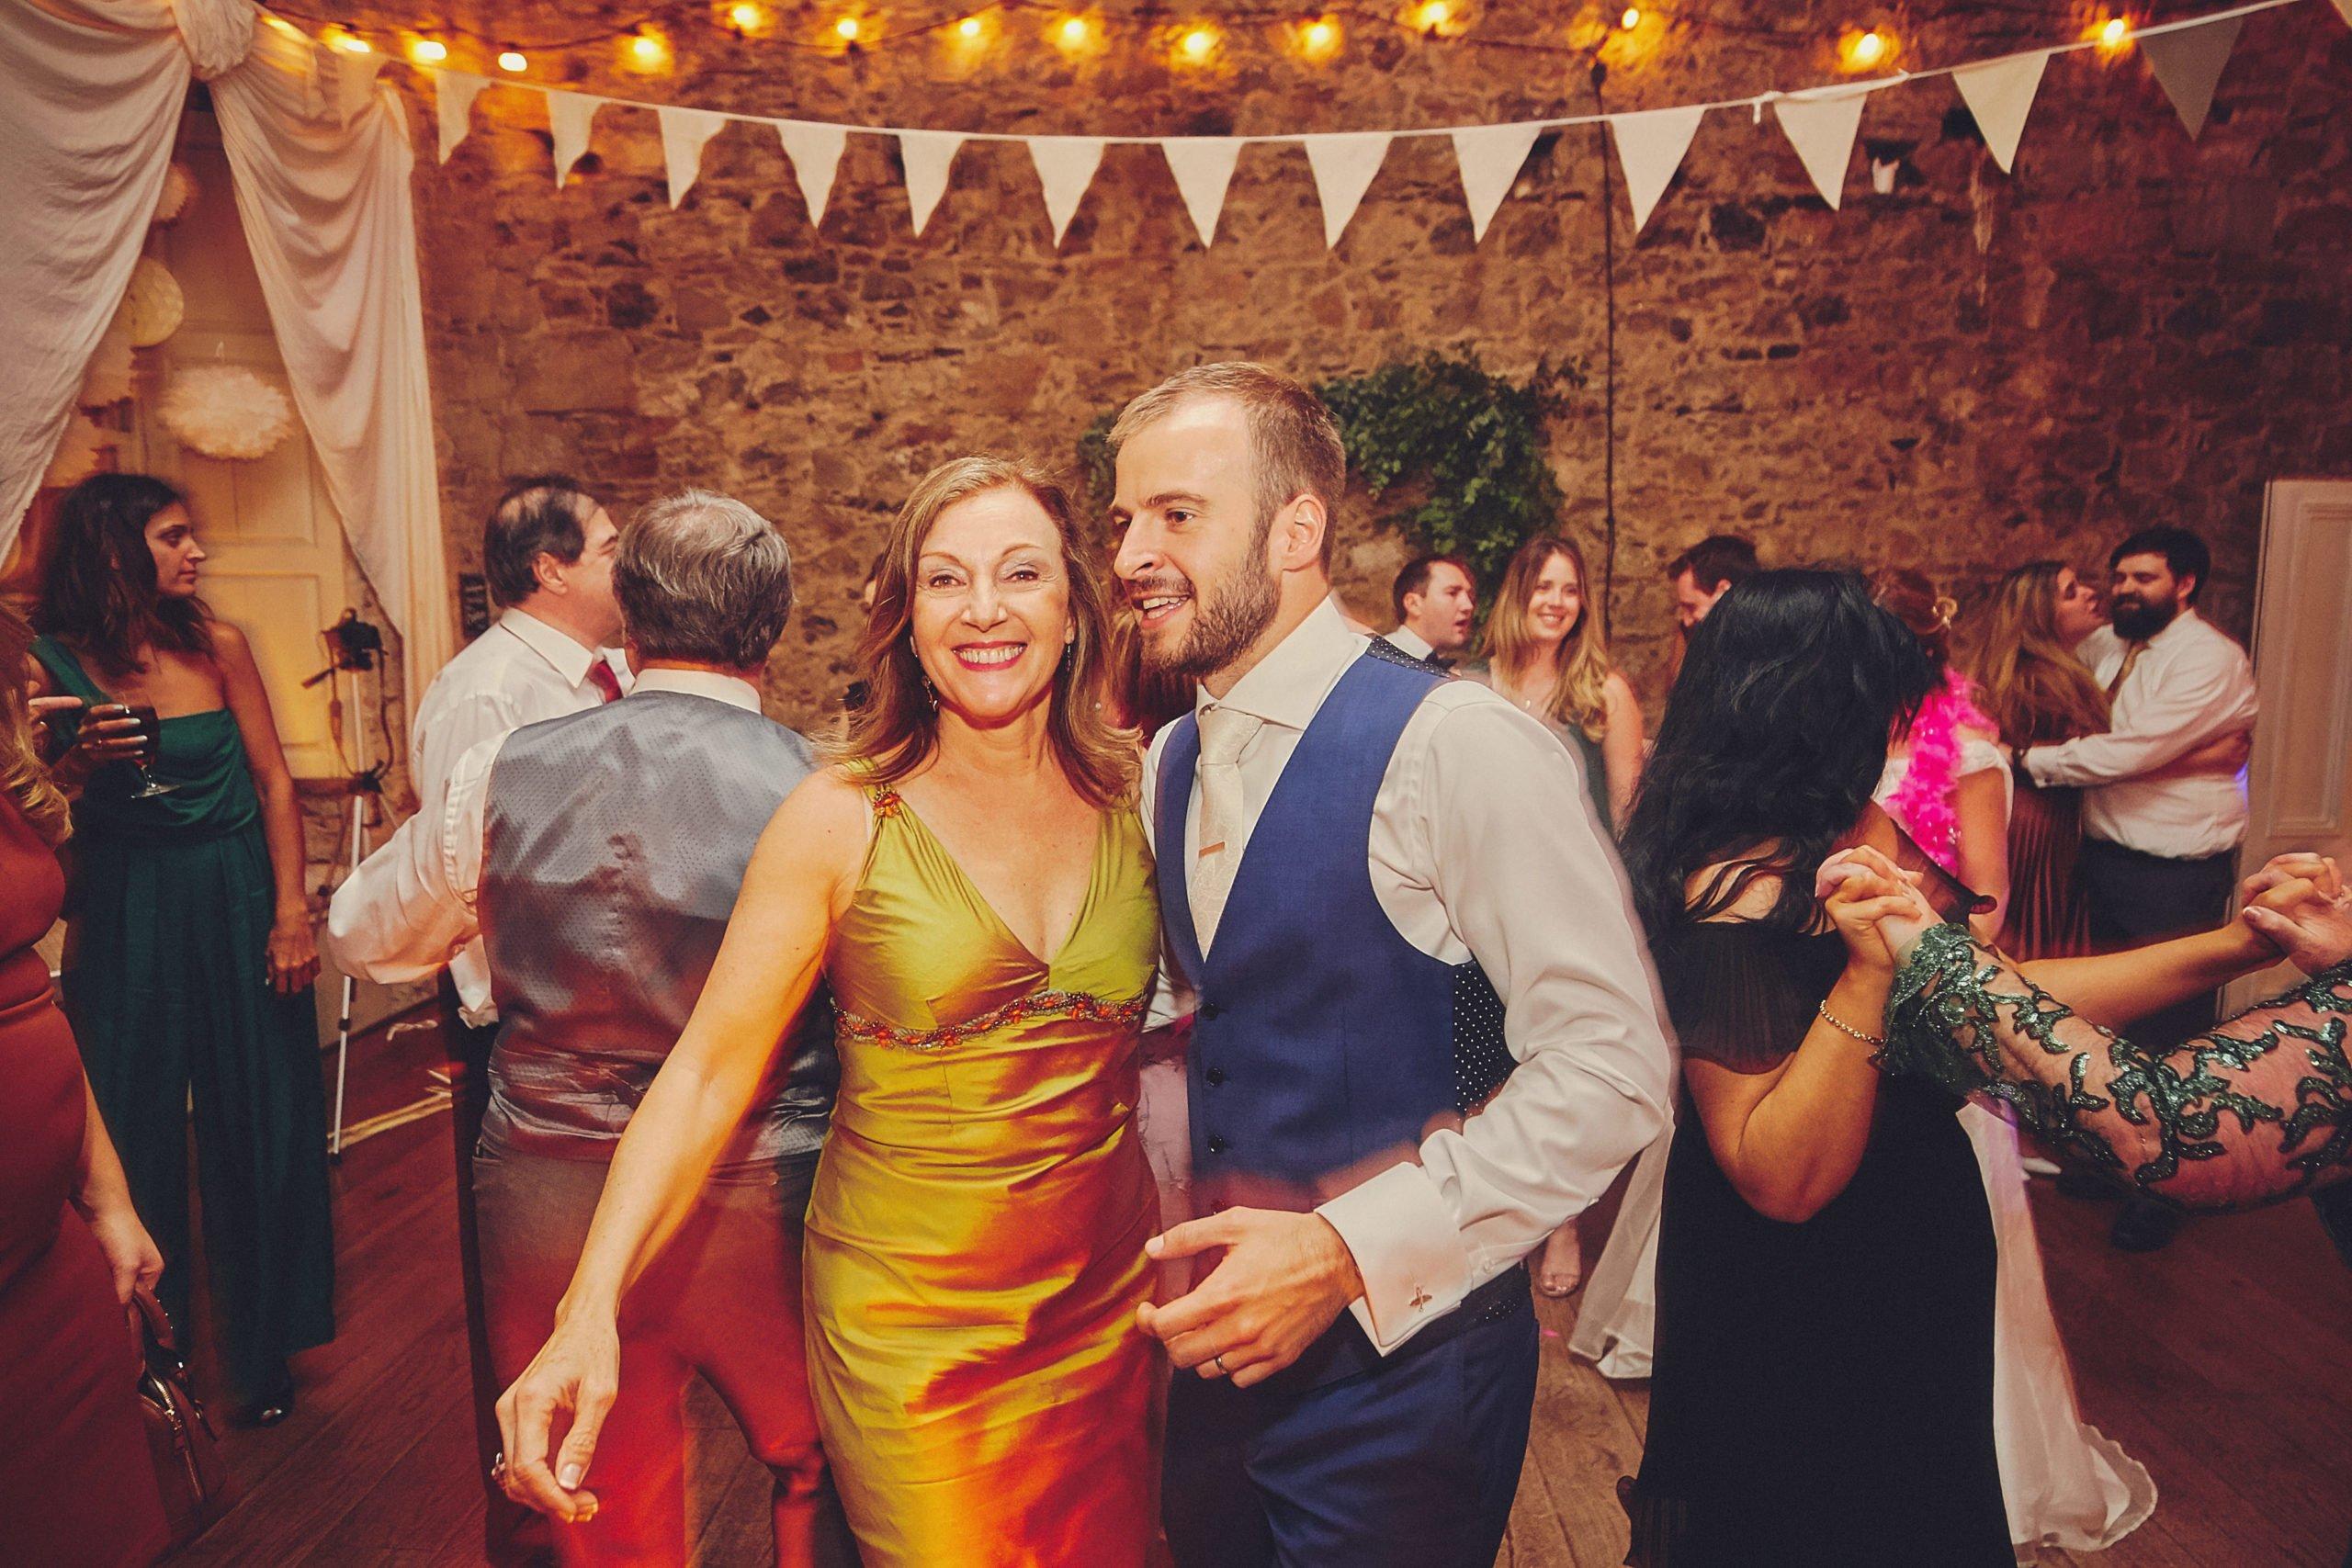 Cloughjordan House Wedding - Alternative Venue 157